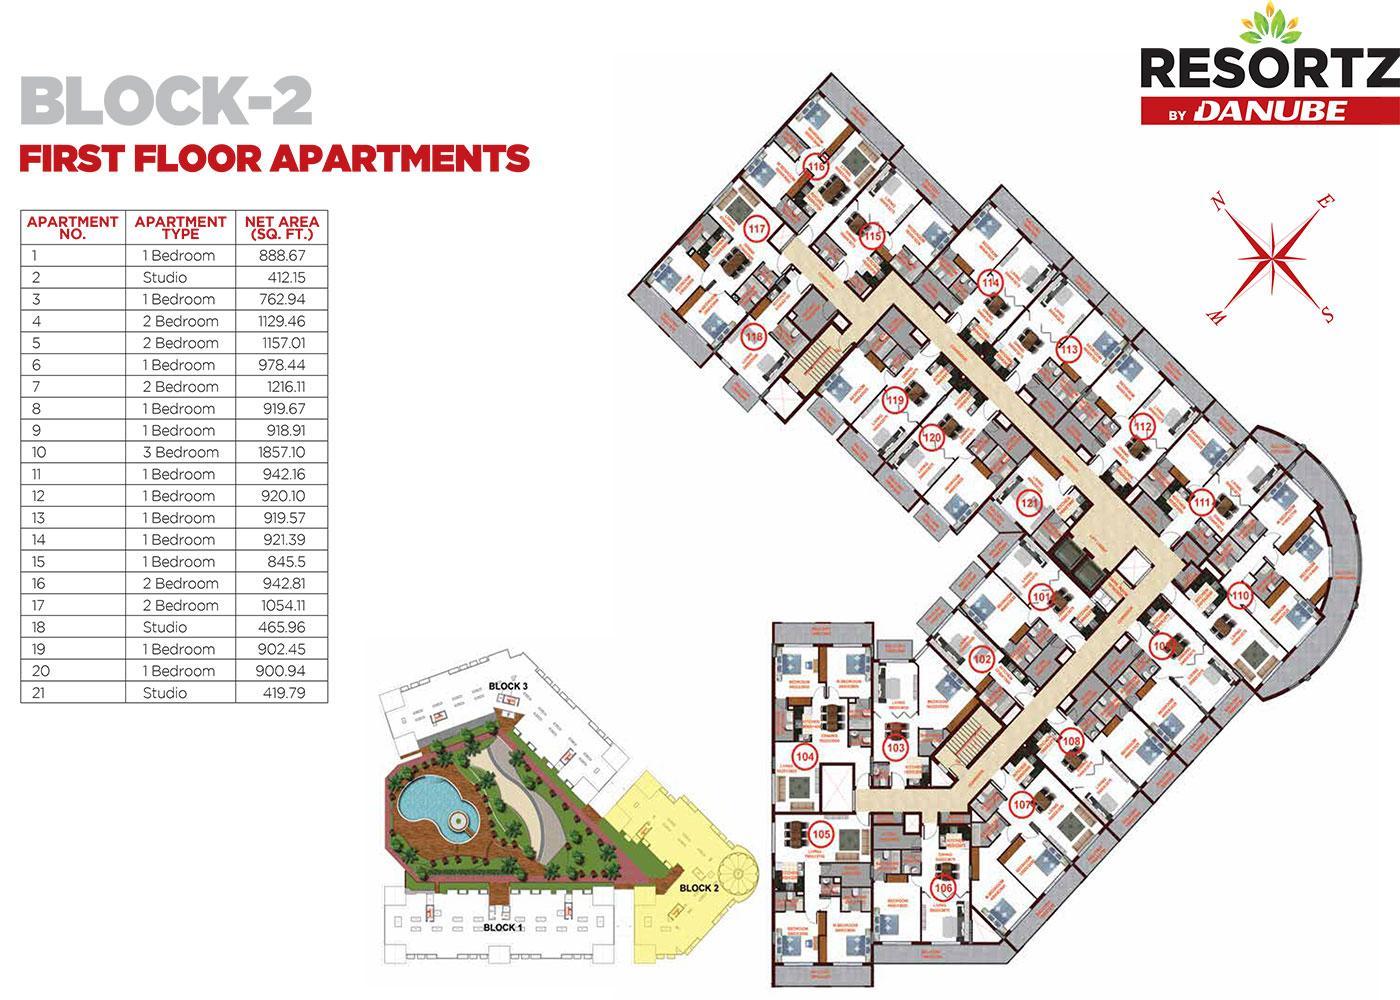 First Floor Apartments Block 2